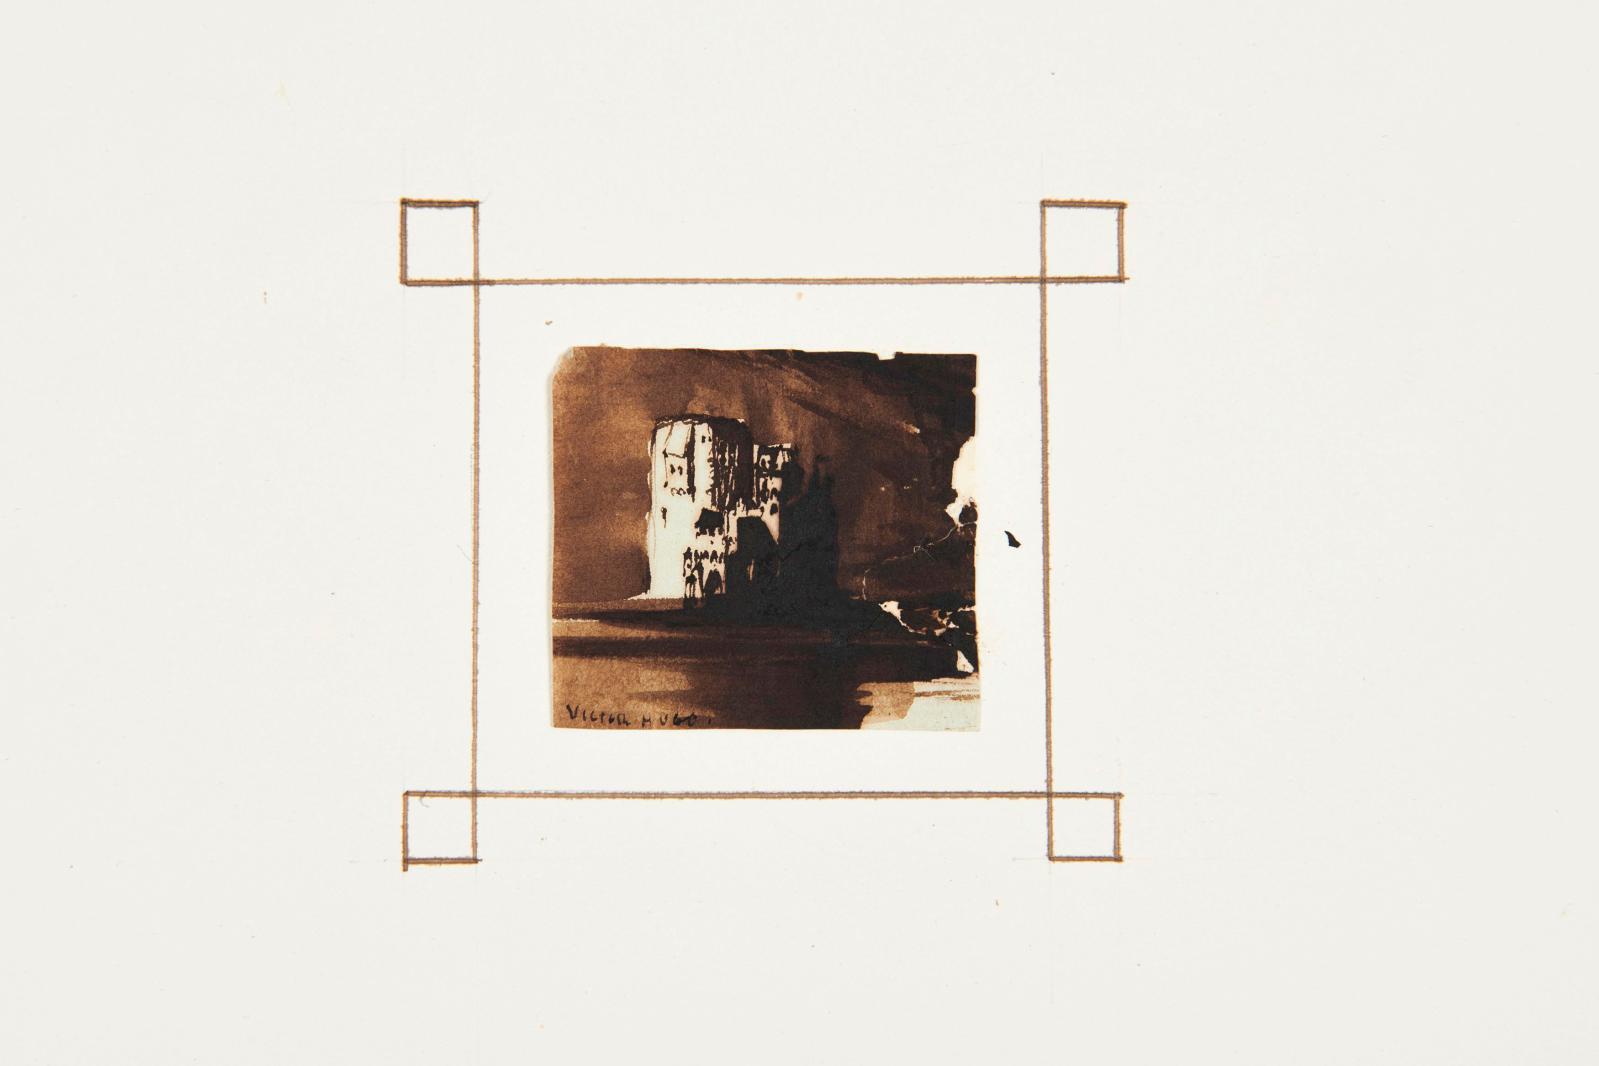 Album Amicorum d'Elisa Denain (in-folio), comprenant 51dessins, dont 8par Victor Hugo(1802-1885), lavis brun, dim.de l'album 35x47c